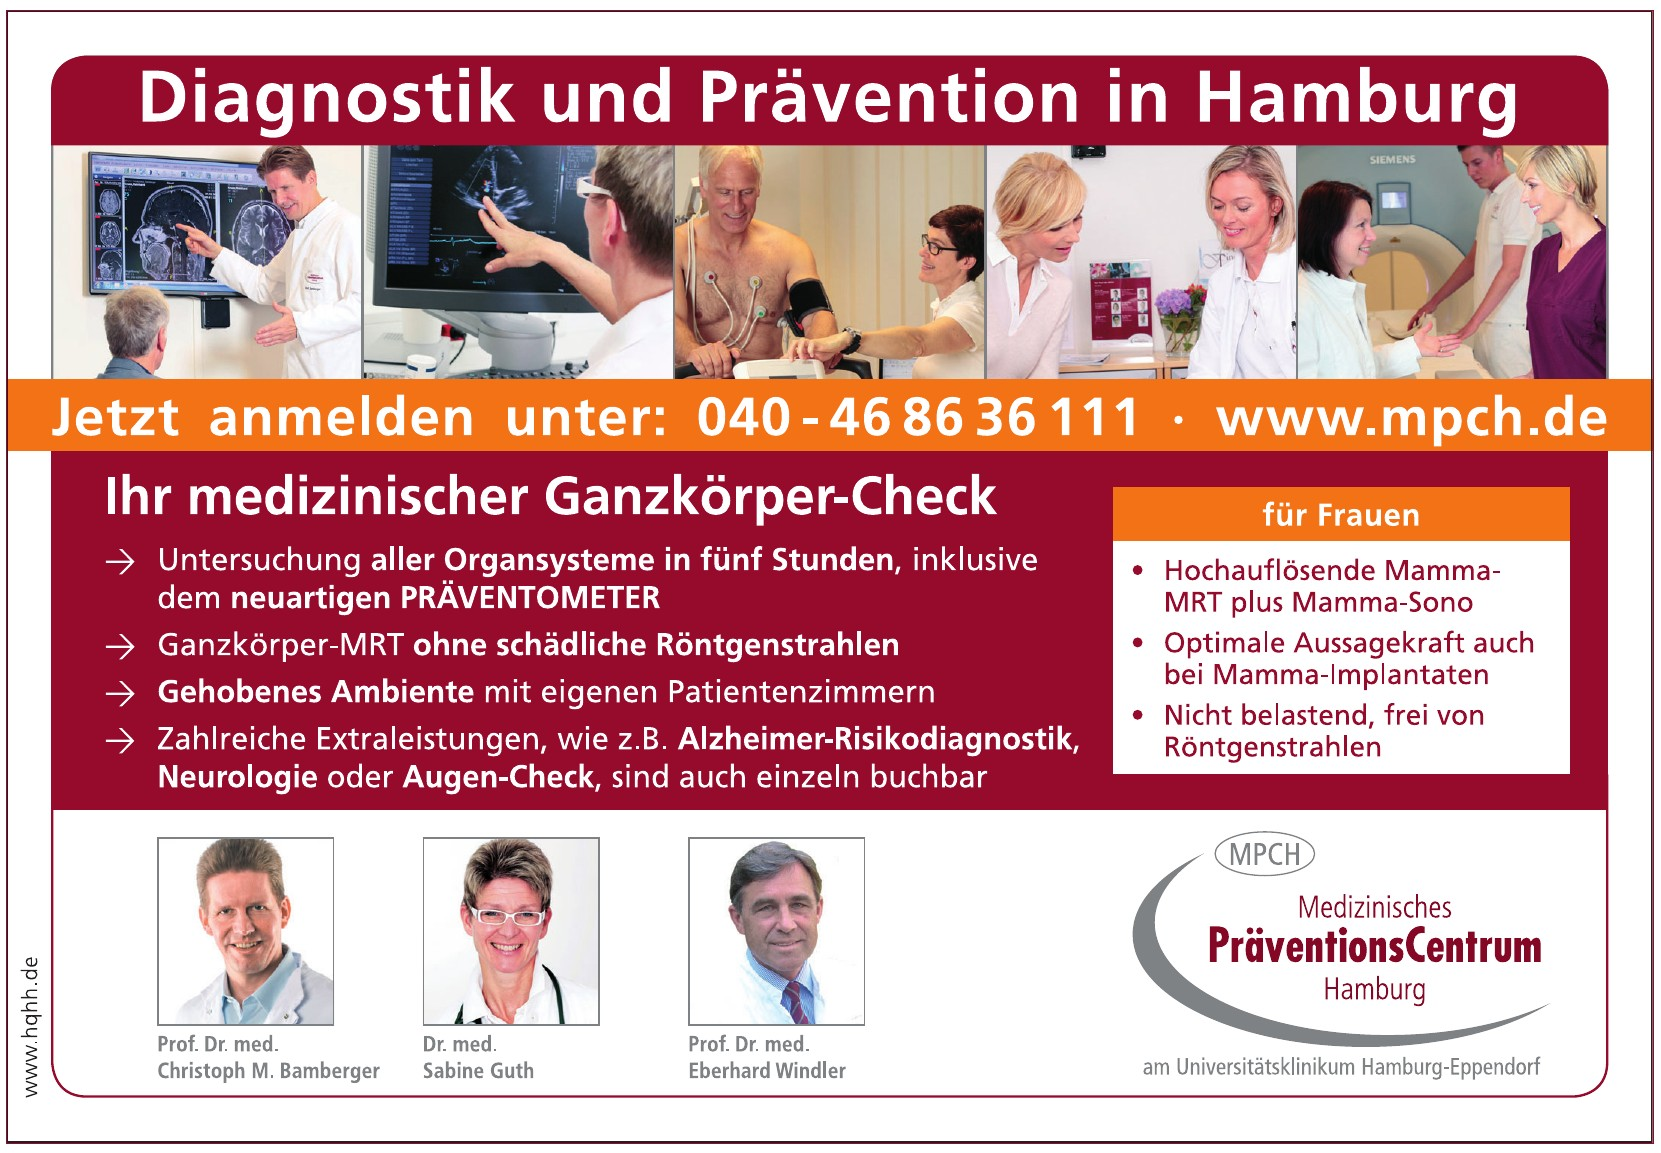 Medical Prevention Center Hamburg (MPCH)